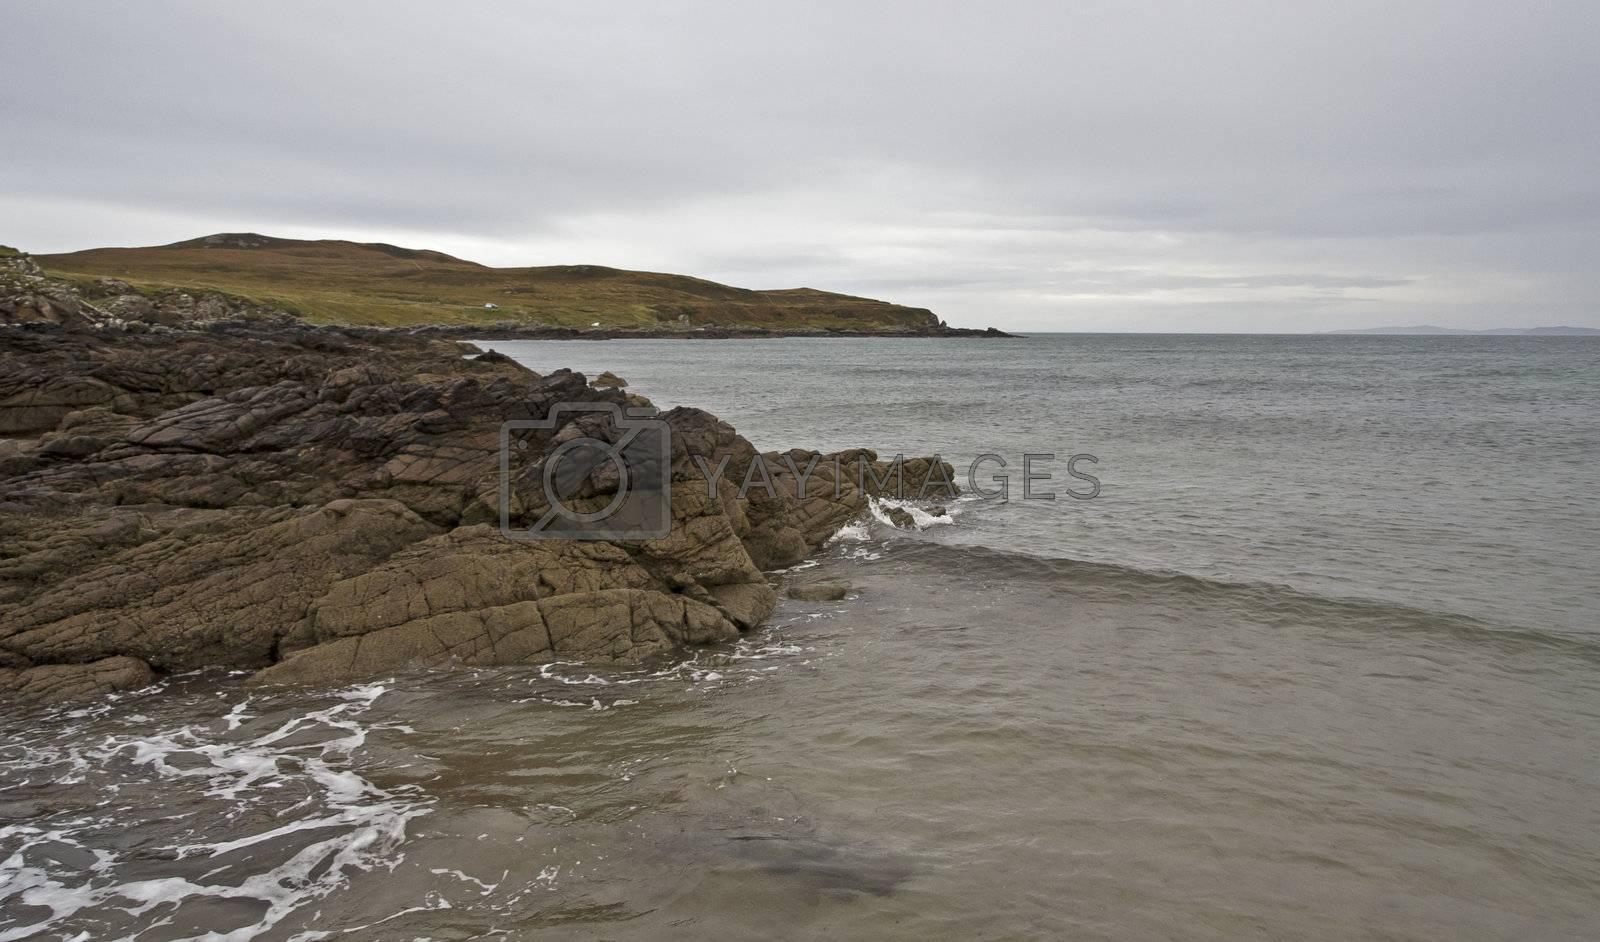 stoney coastline in scotland with small hill in background